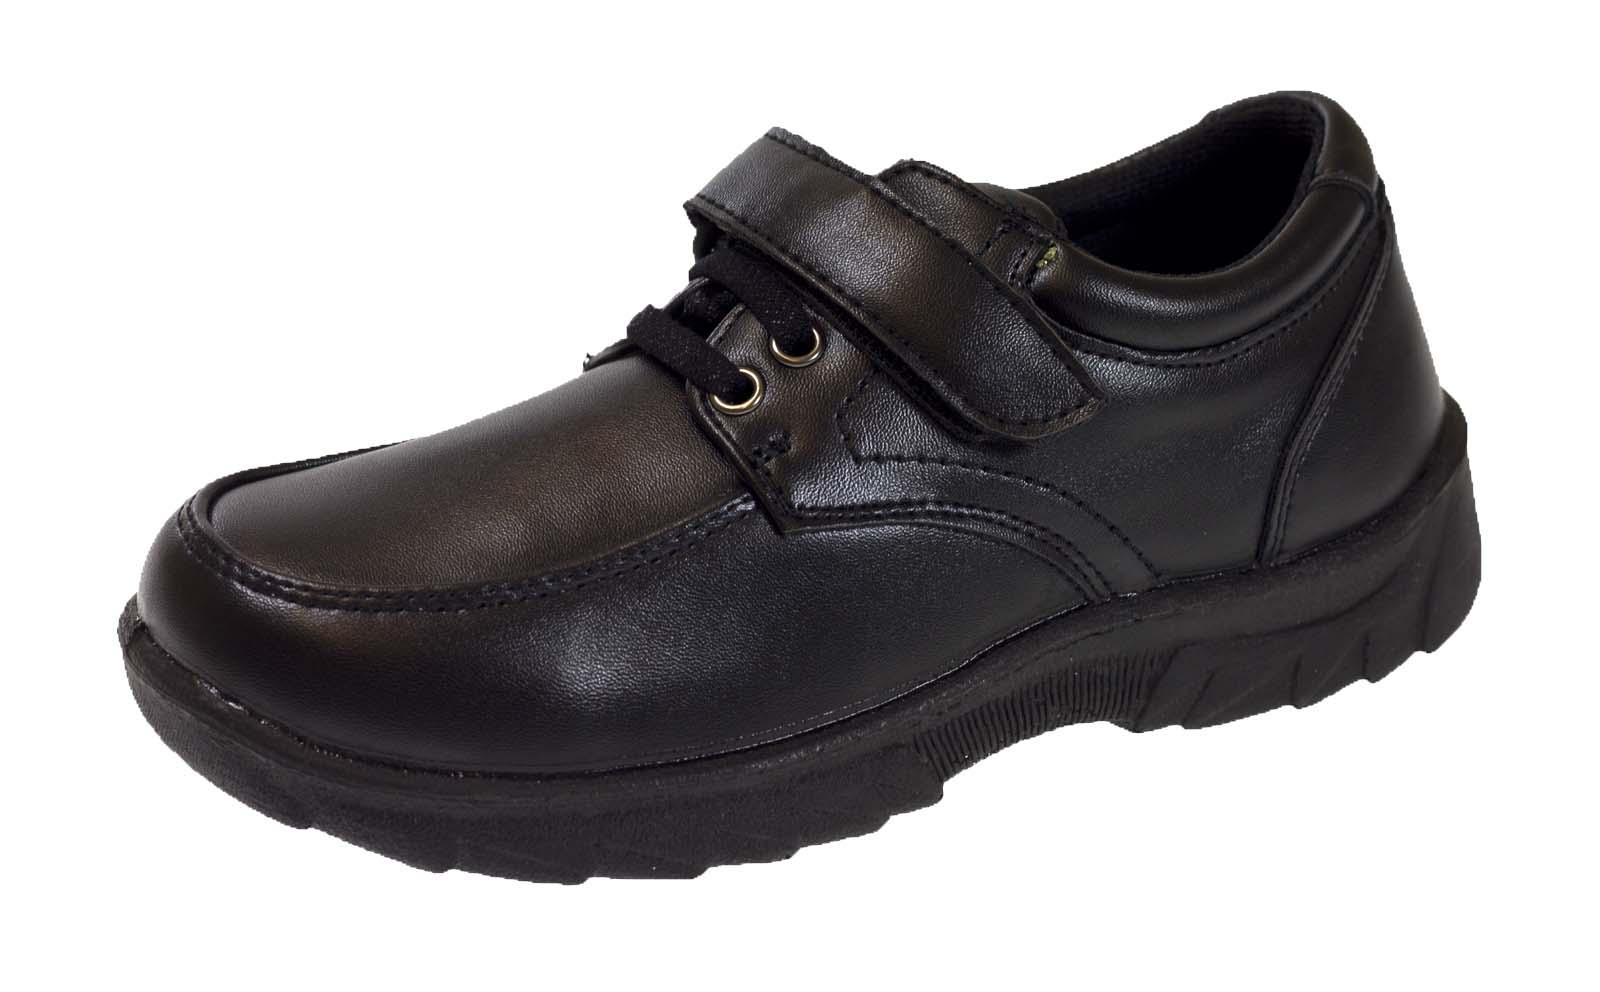 Boys Black Faux Leather School Shoes UK Infant Size 8,10 /& UK Kid 11